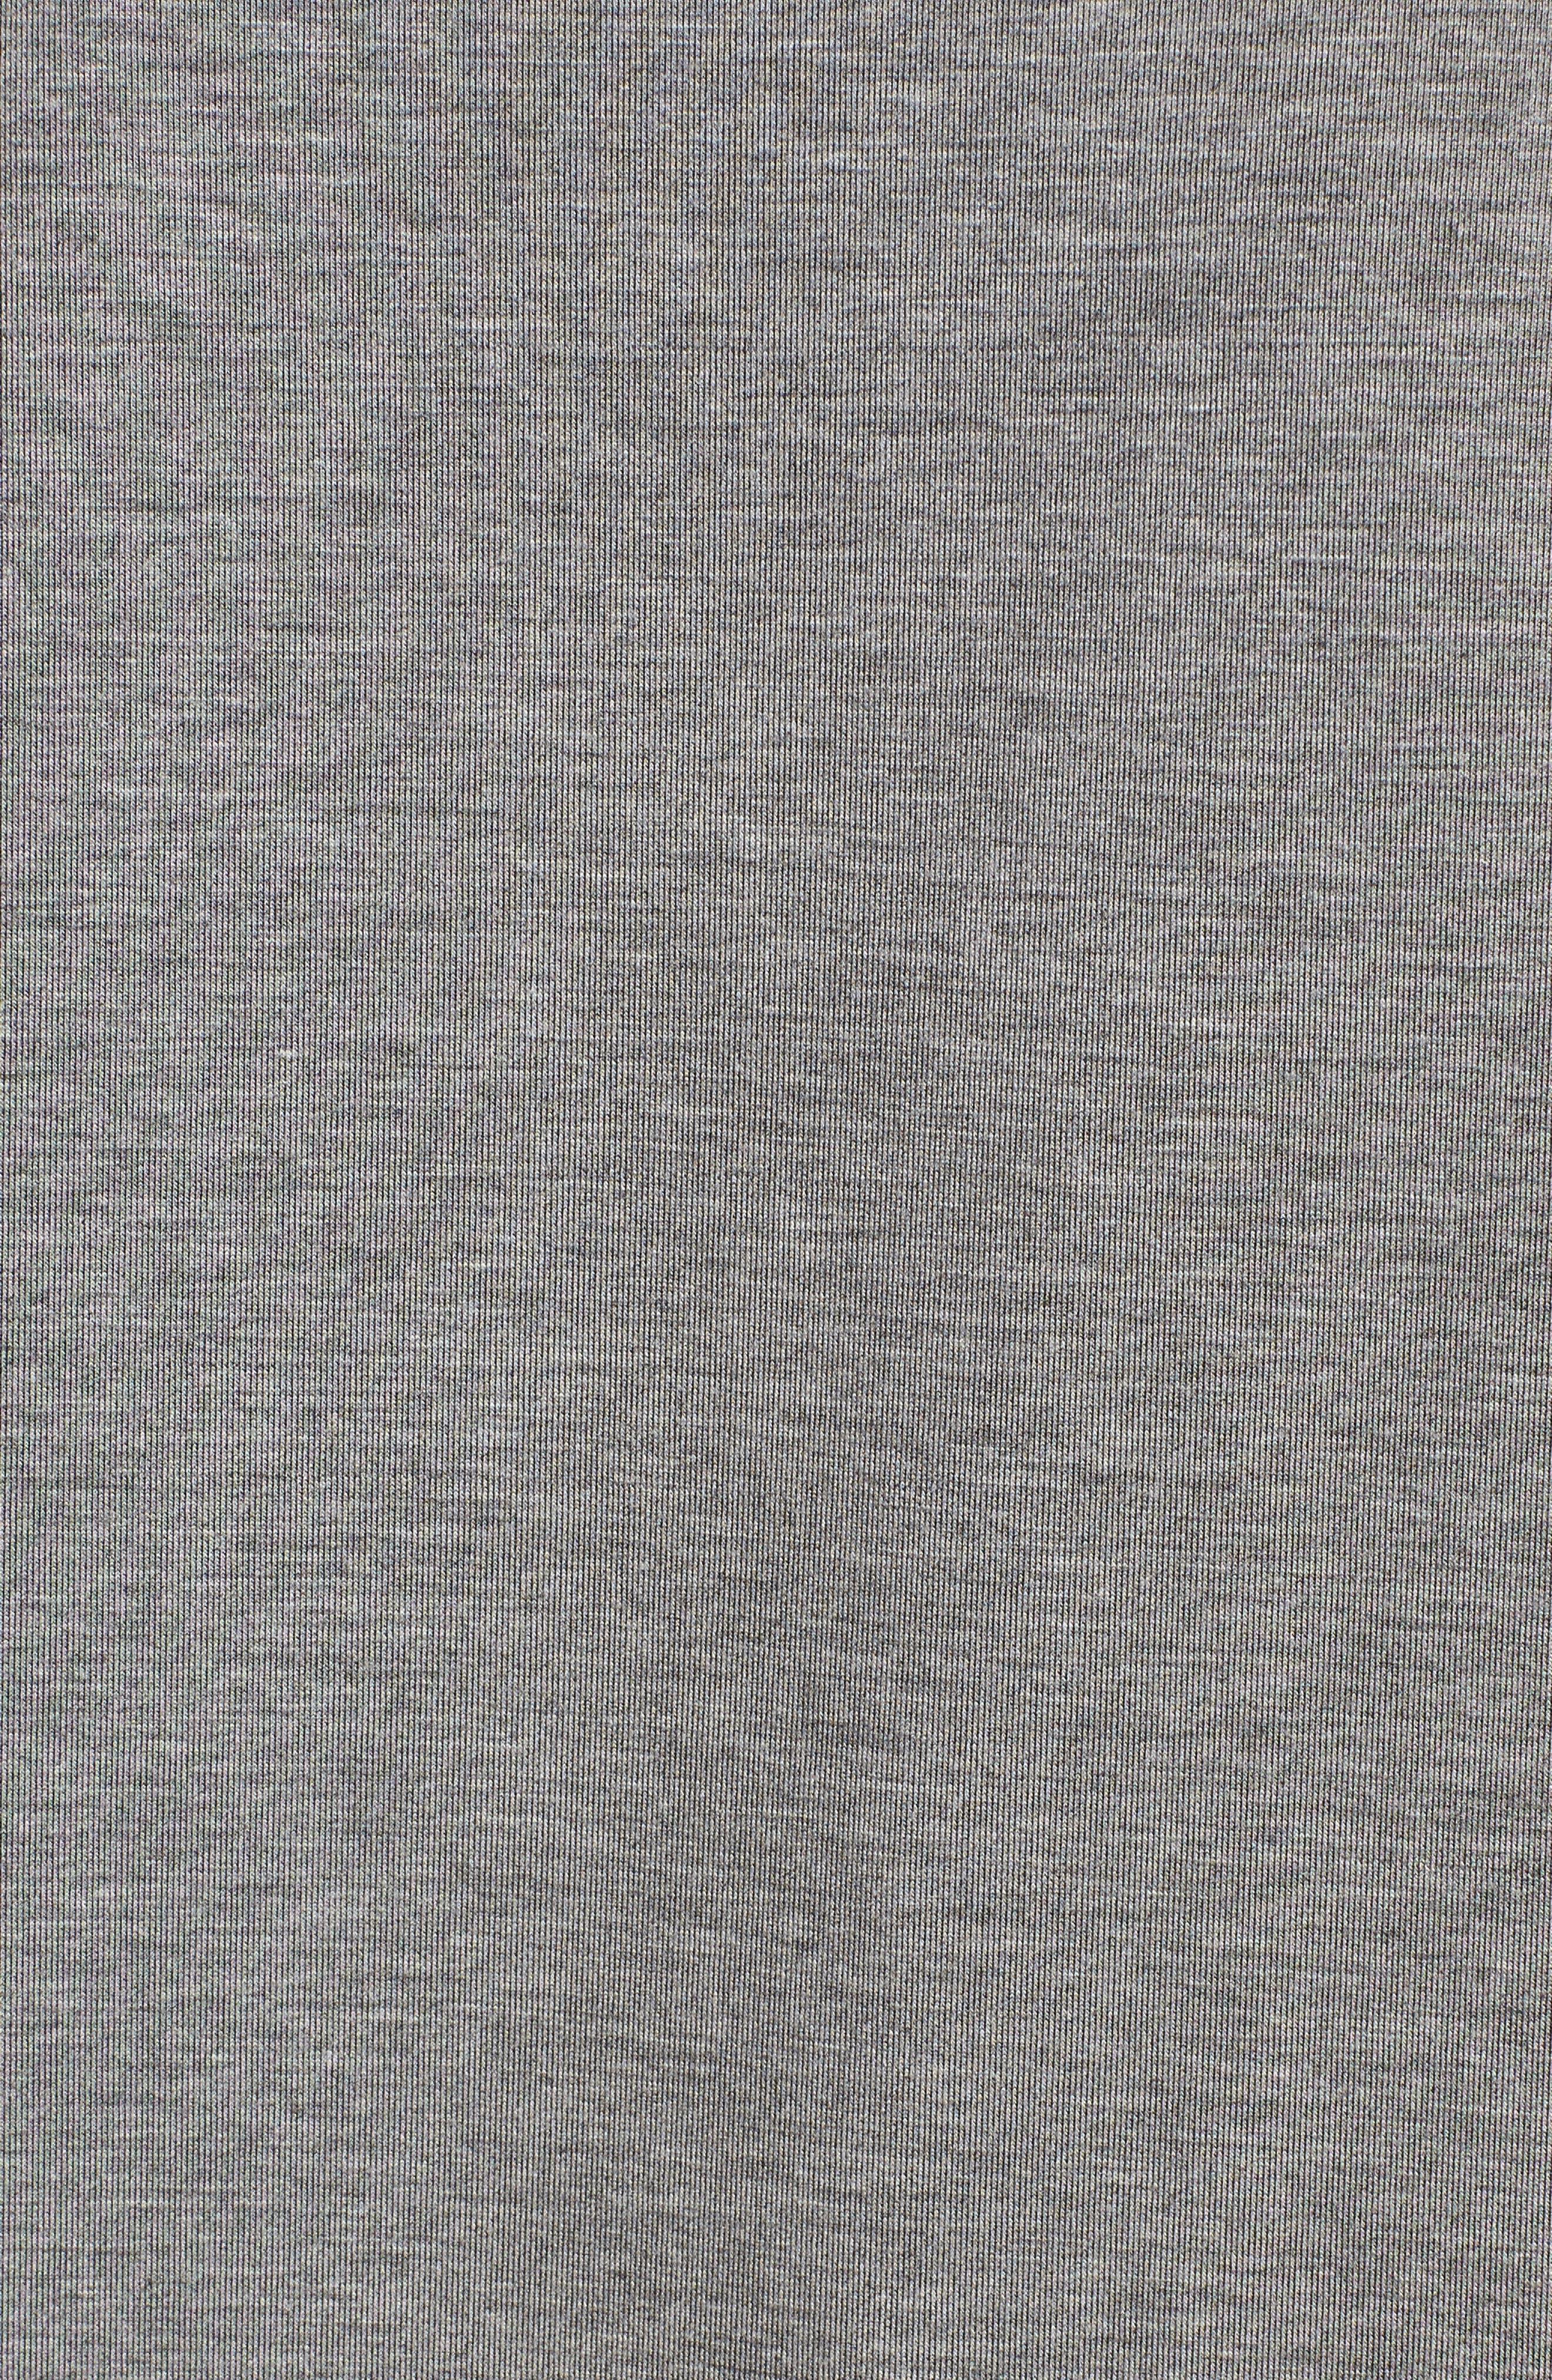 Mixed Media Sweatshirt Dress,                             Alternate thumbnail 5, color,                             030